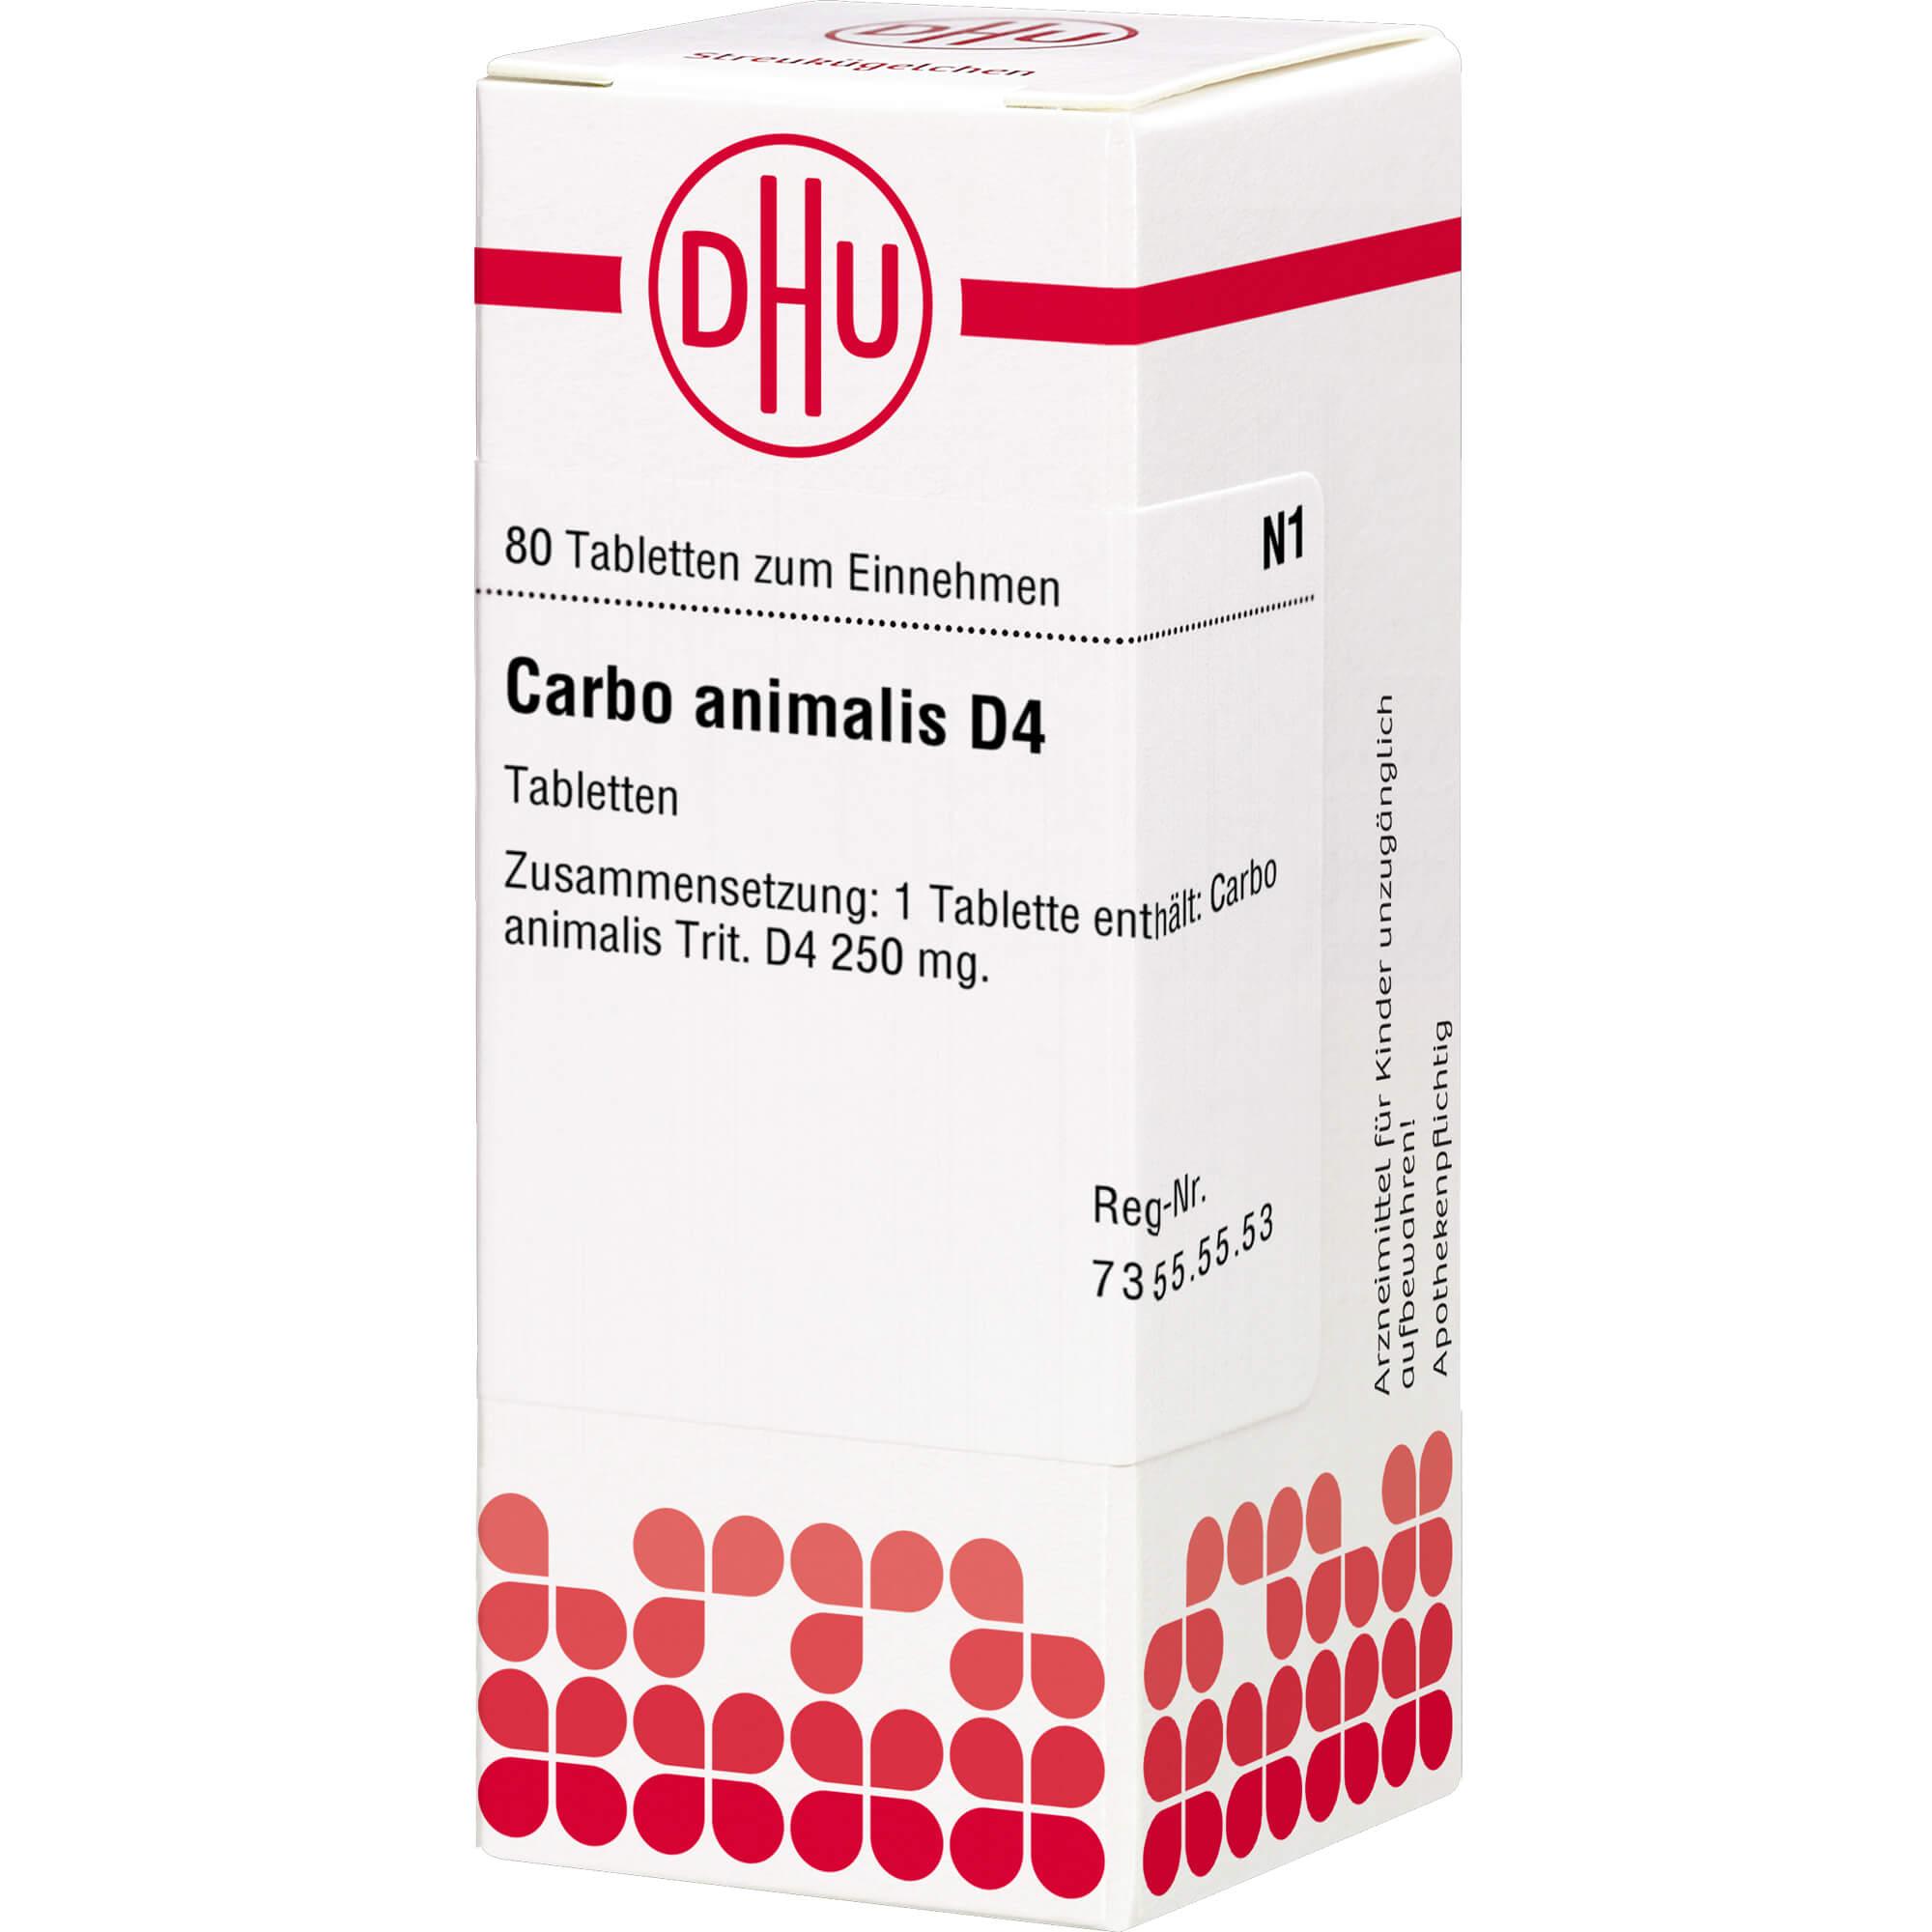 CARBO ANIMALIS D 4 Tabletten